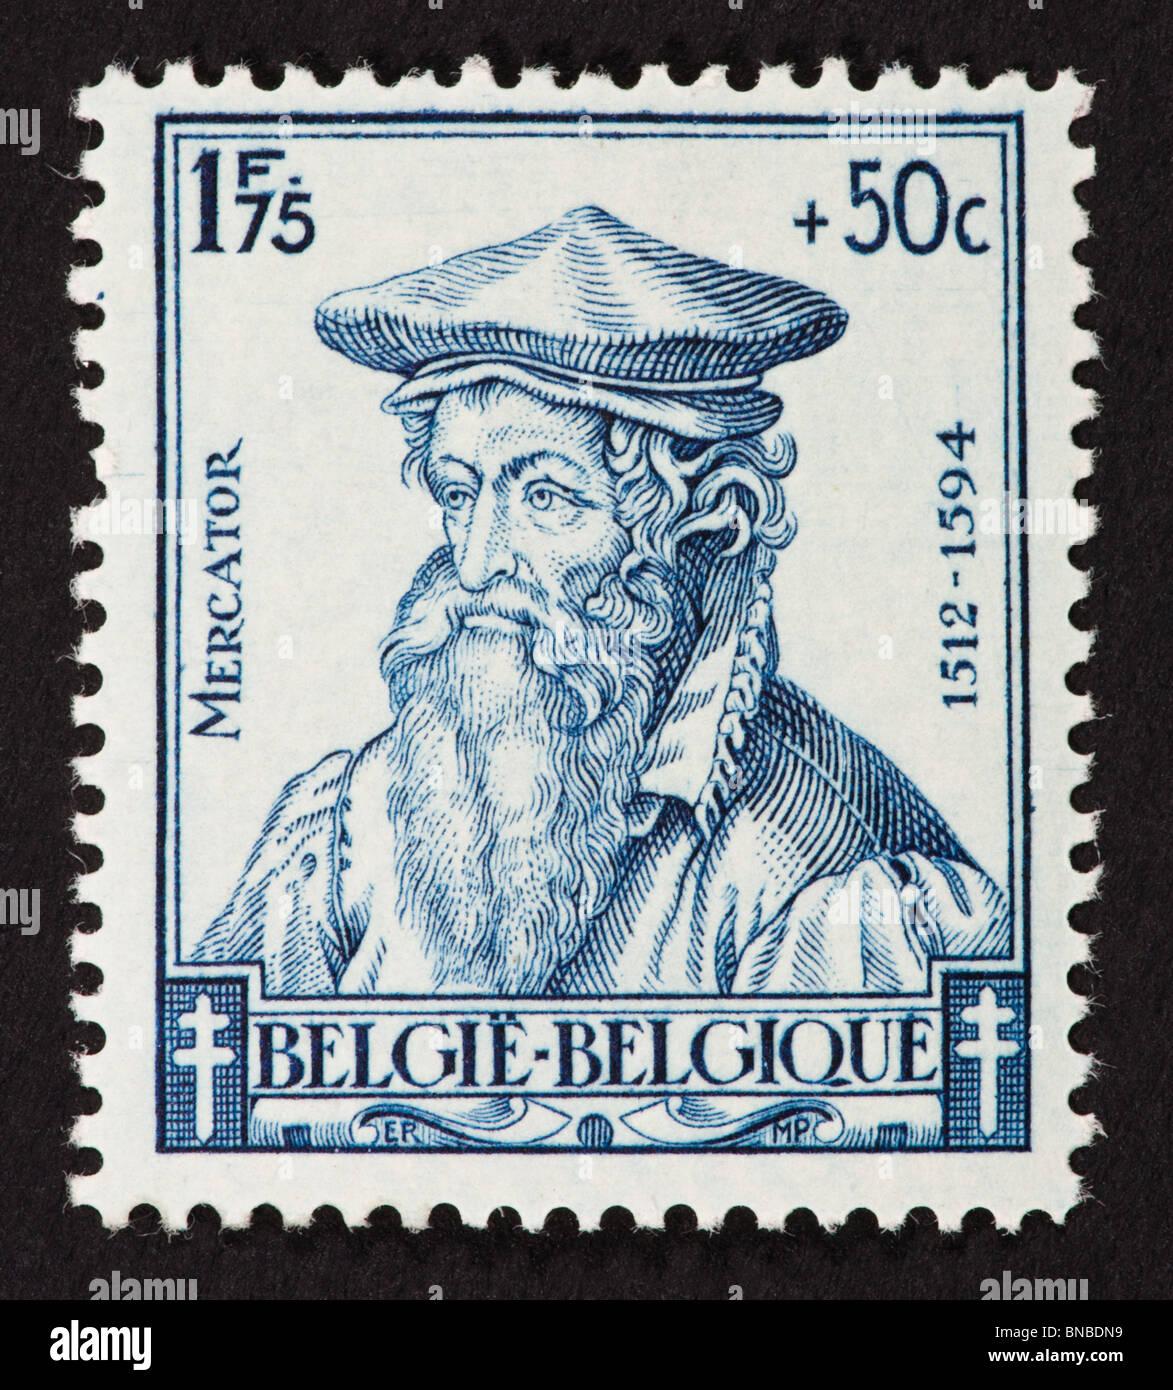 Postage stamp from Belgium depicting Gerardus Mercator. - Stock Image